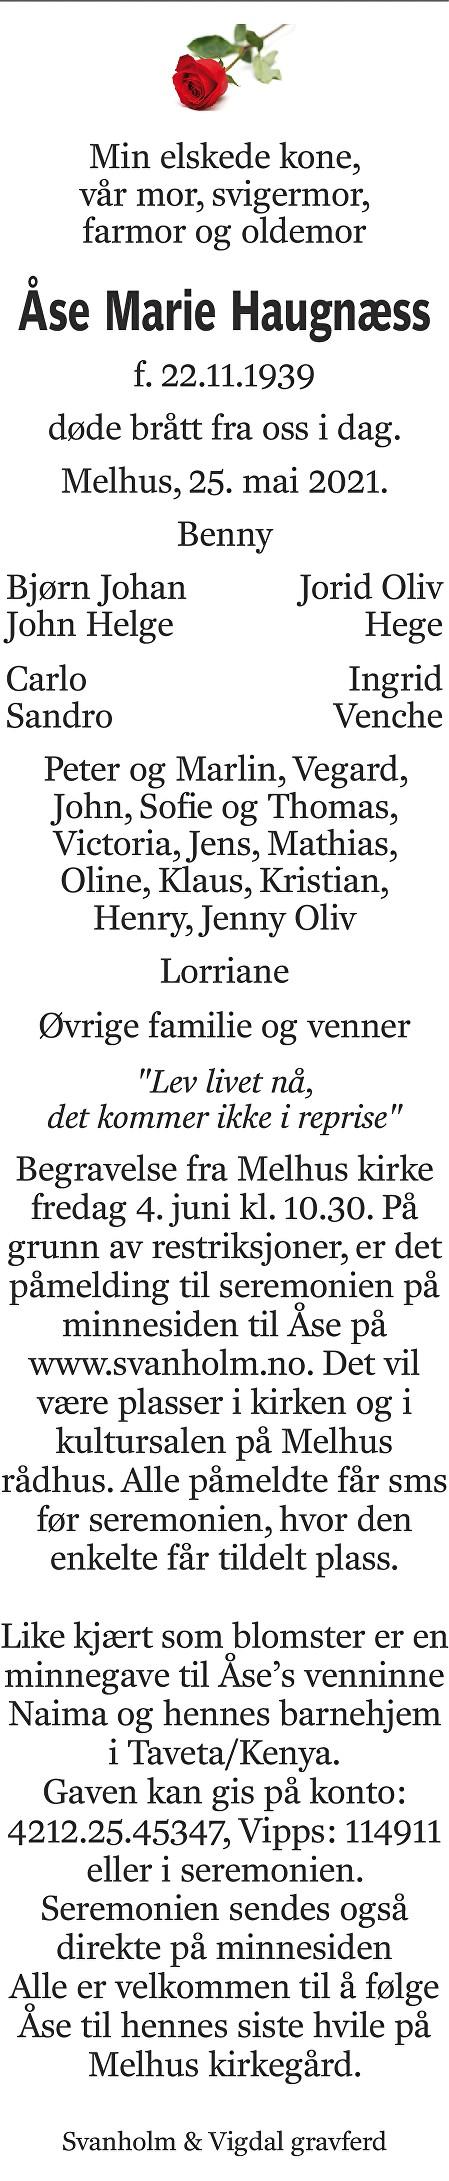 Åse Marie Haugnæss Dødsannonse